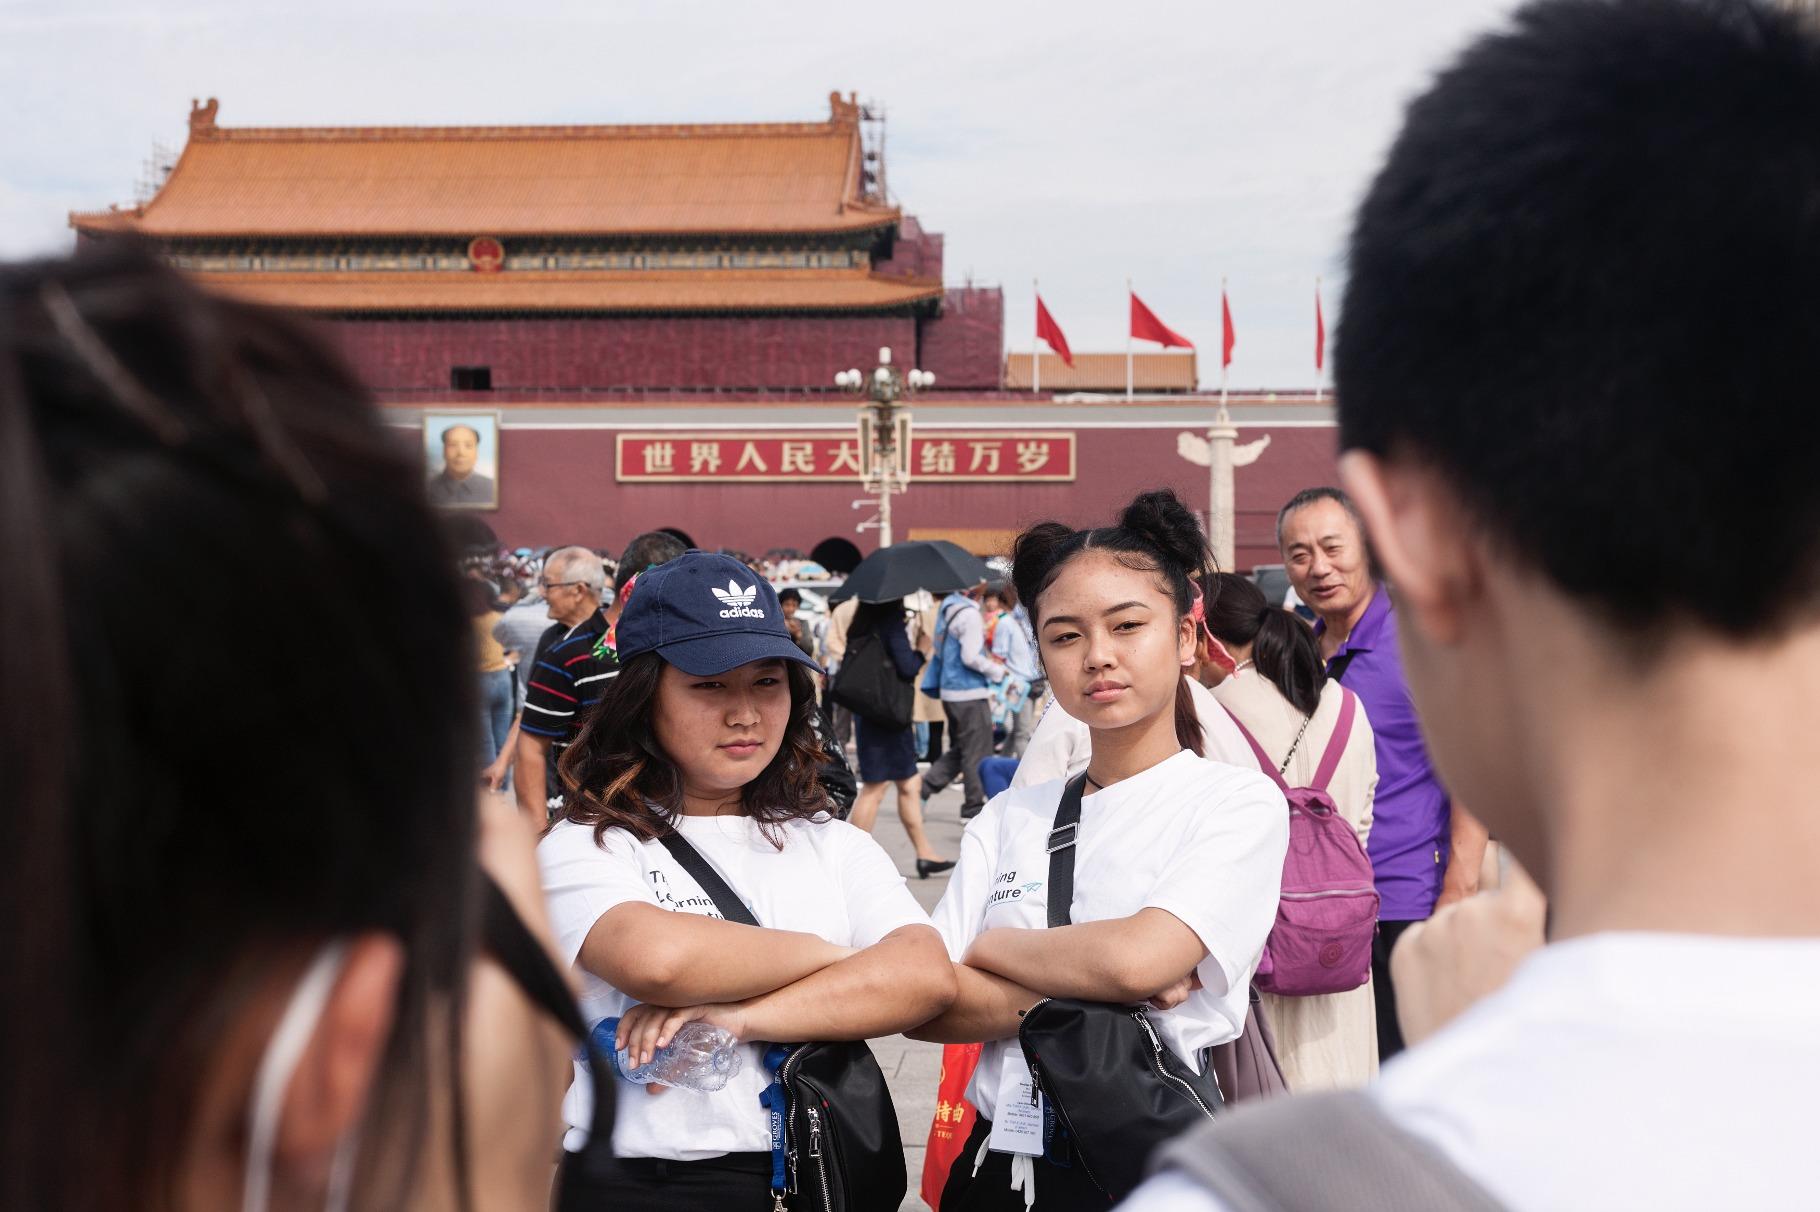 preparation school trip to China